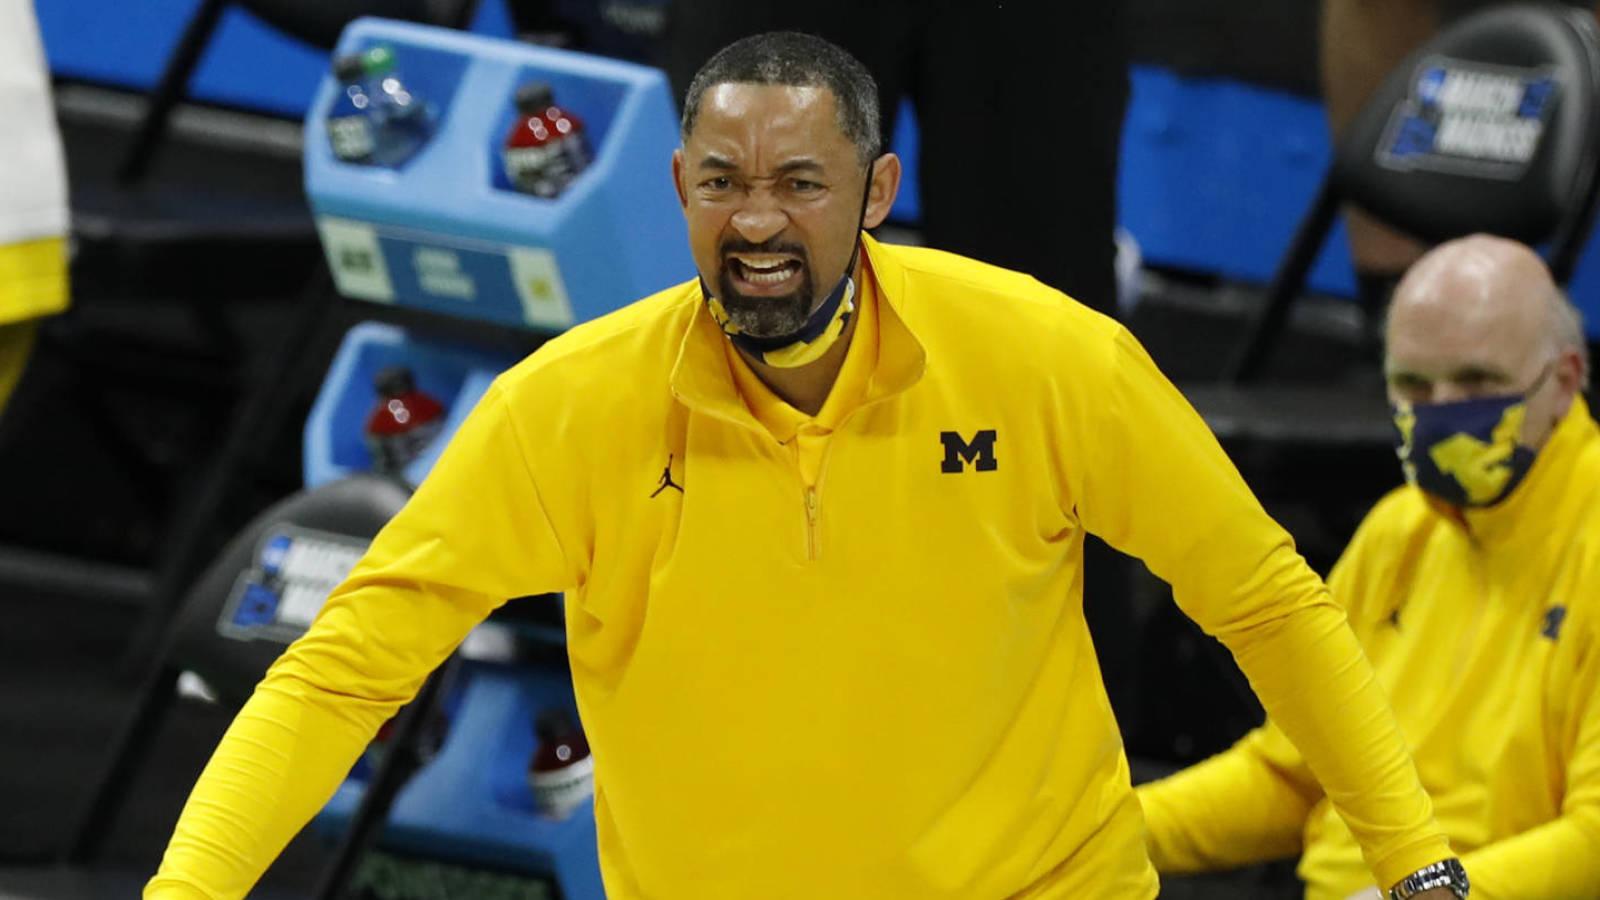 Juwan Howard rejects NBA teams to stay in Michigan